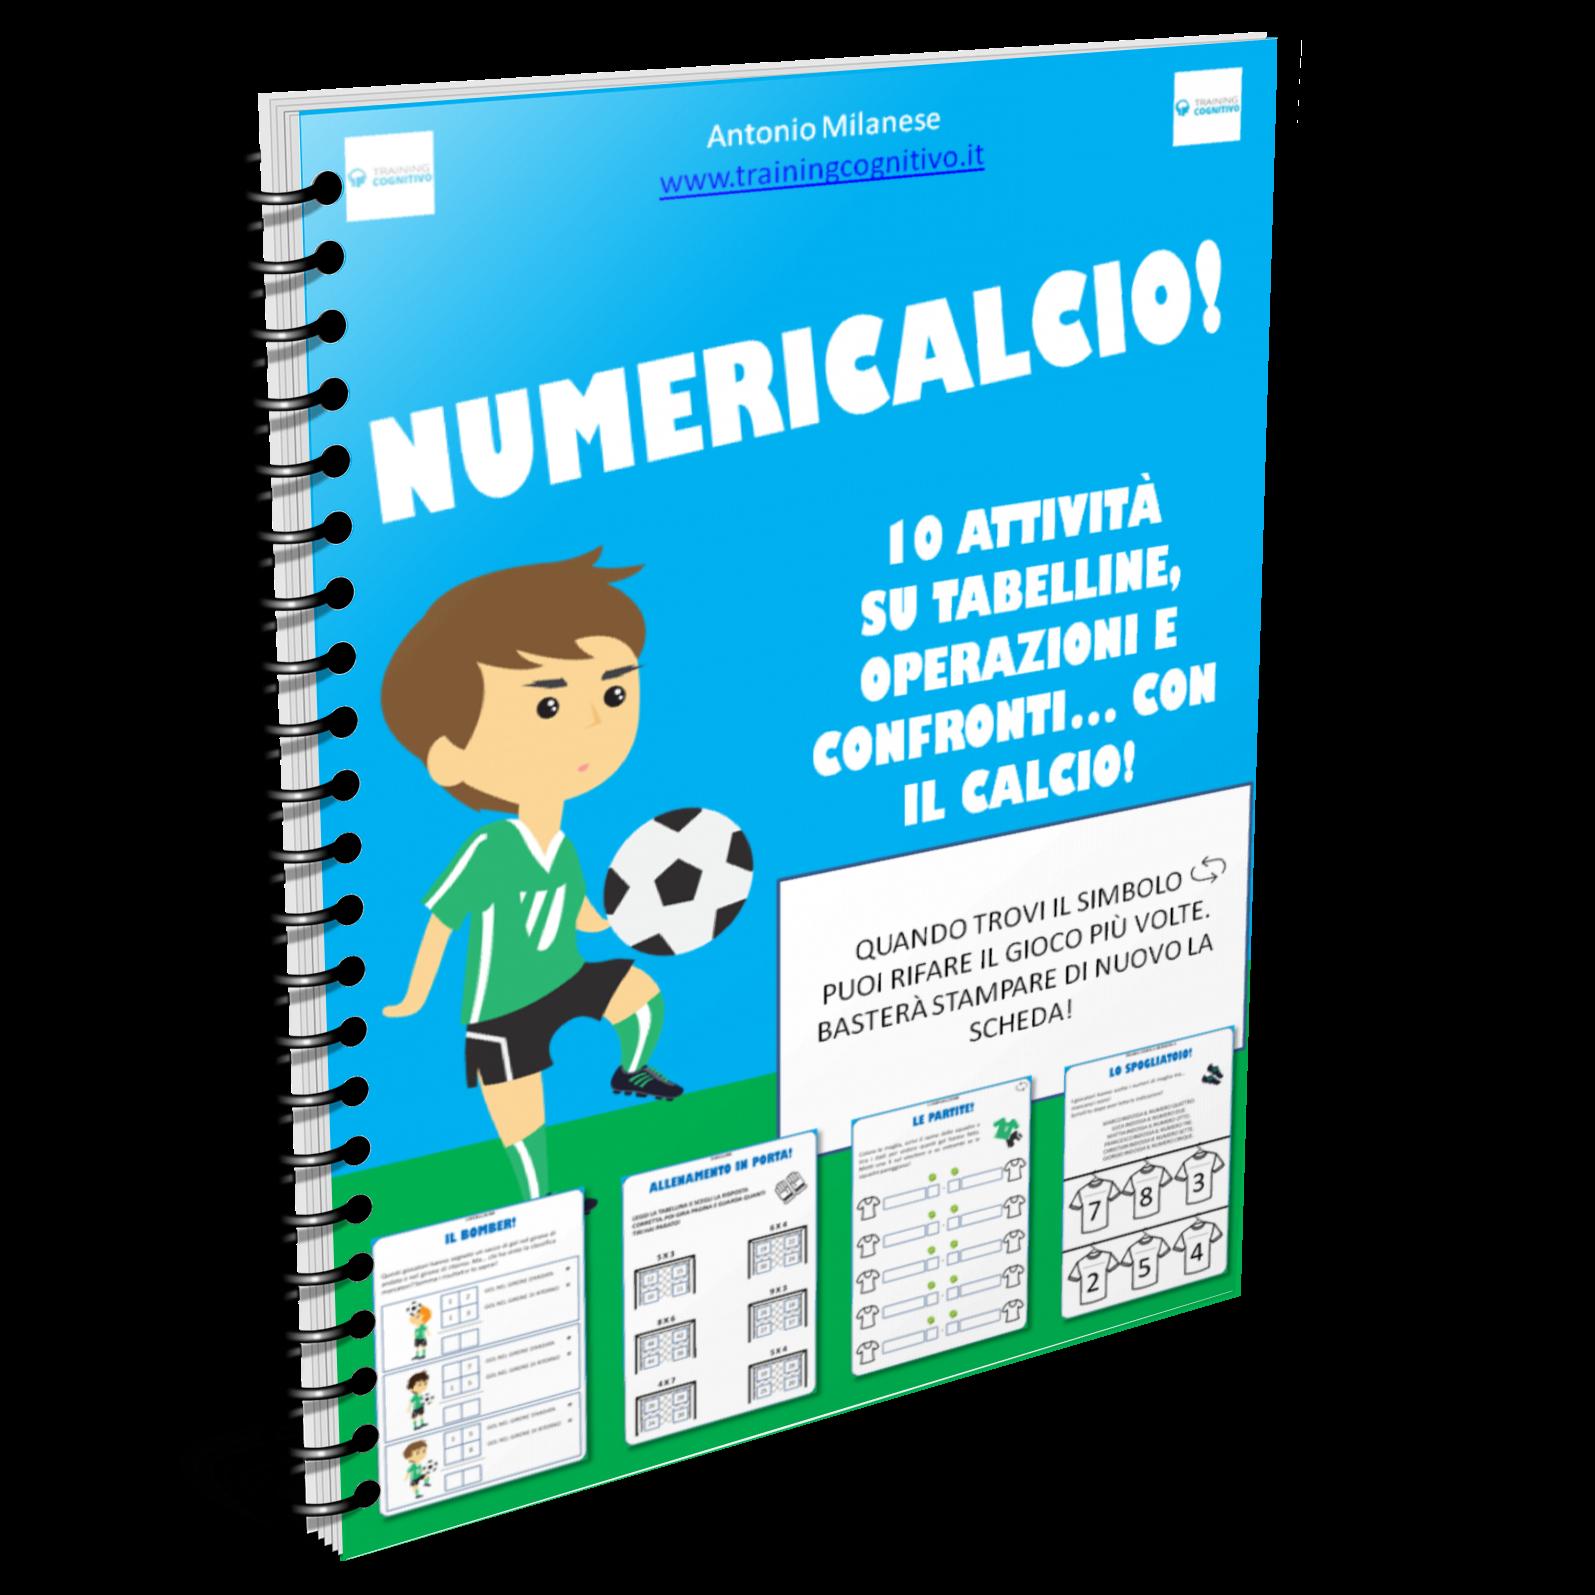 NumeriCalcio: അക്കങ്ങളും ഫുട്ബോളും ഉള്ള പ്രവർത്തനങ്ങൾ